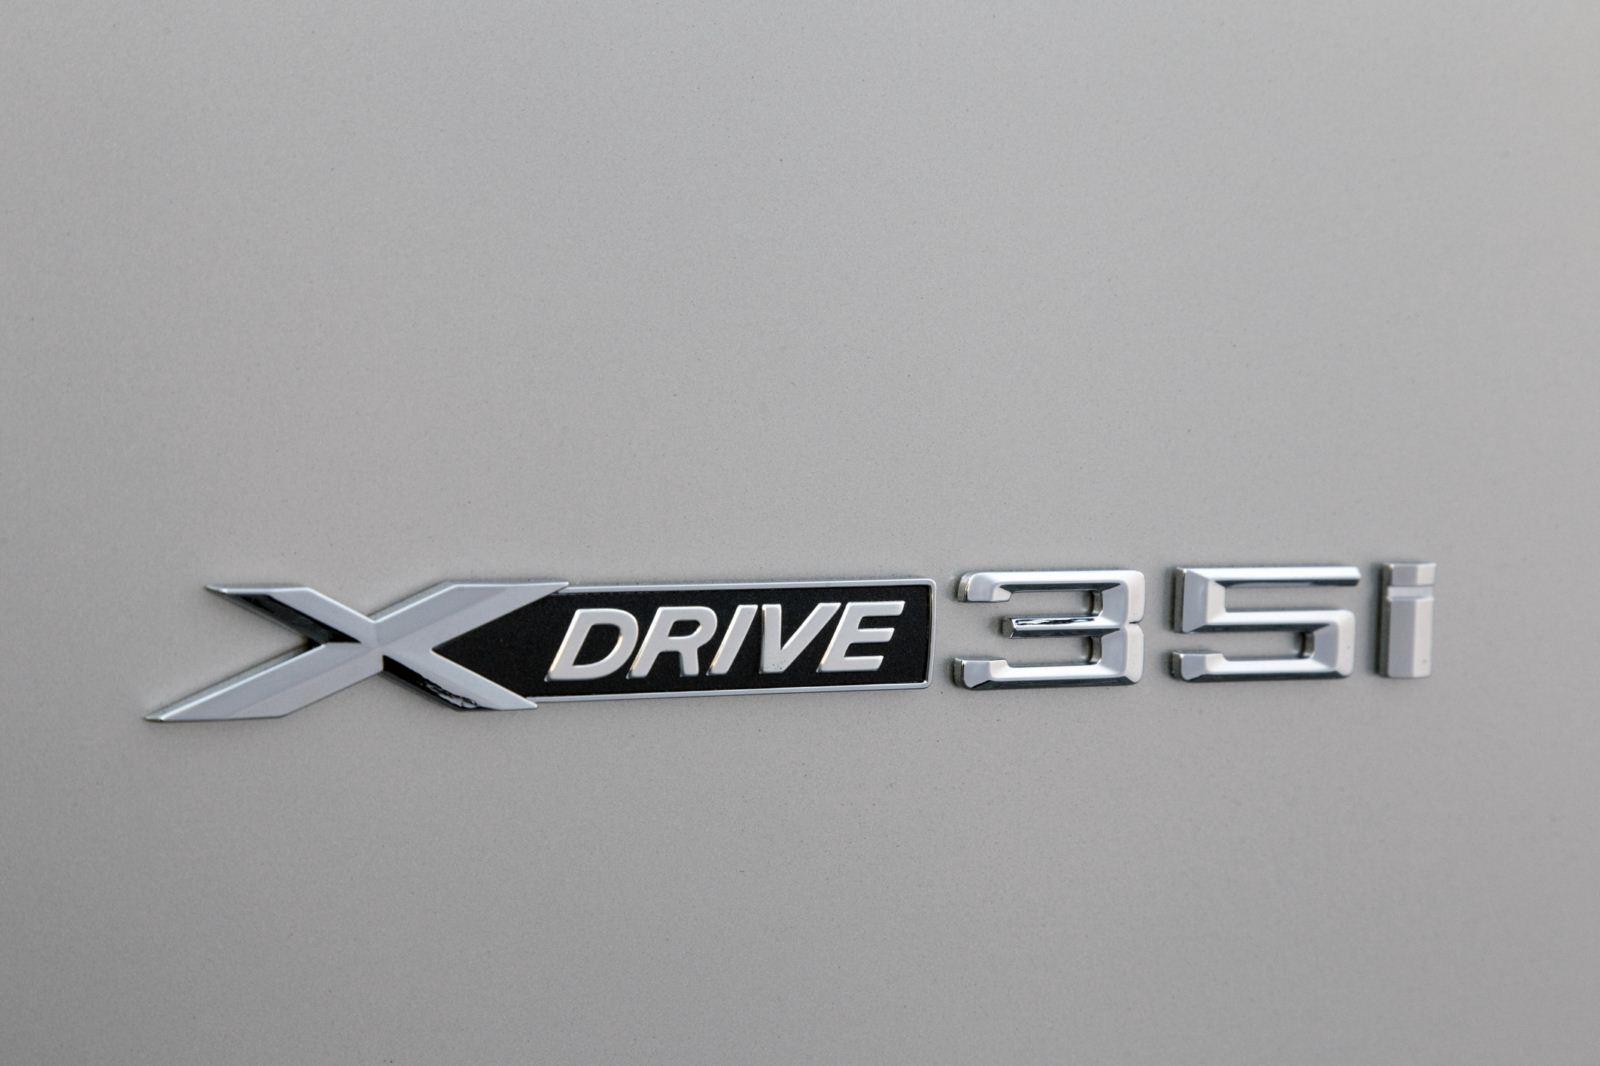 2011 bmw x3 xdrive35i test drive 221